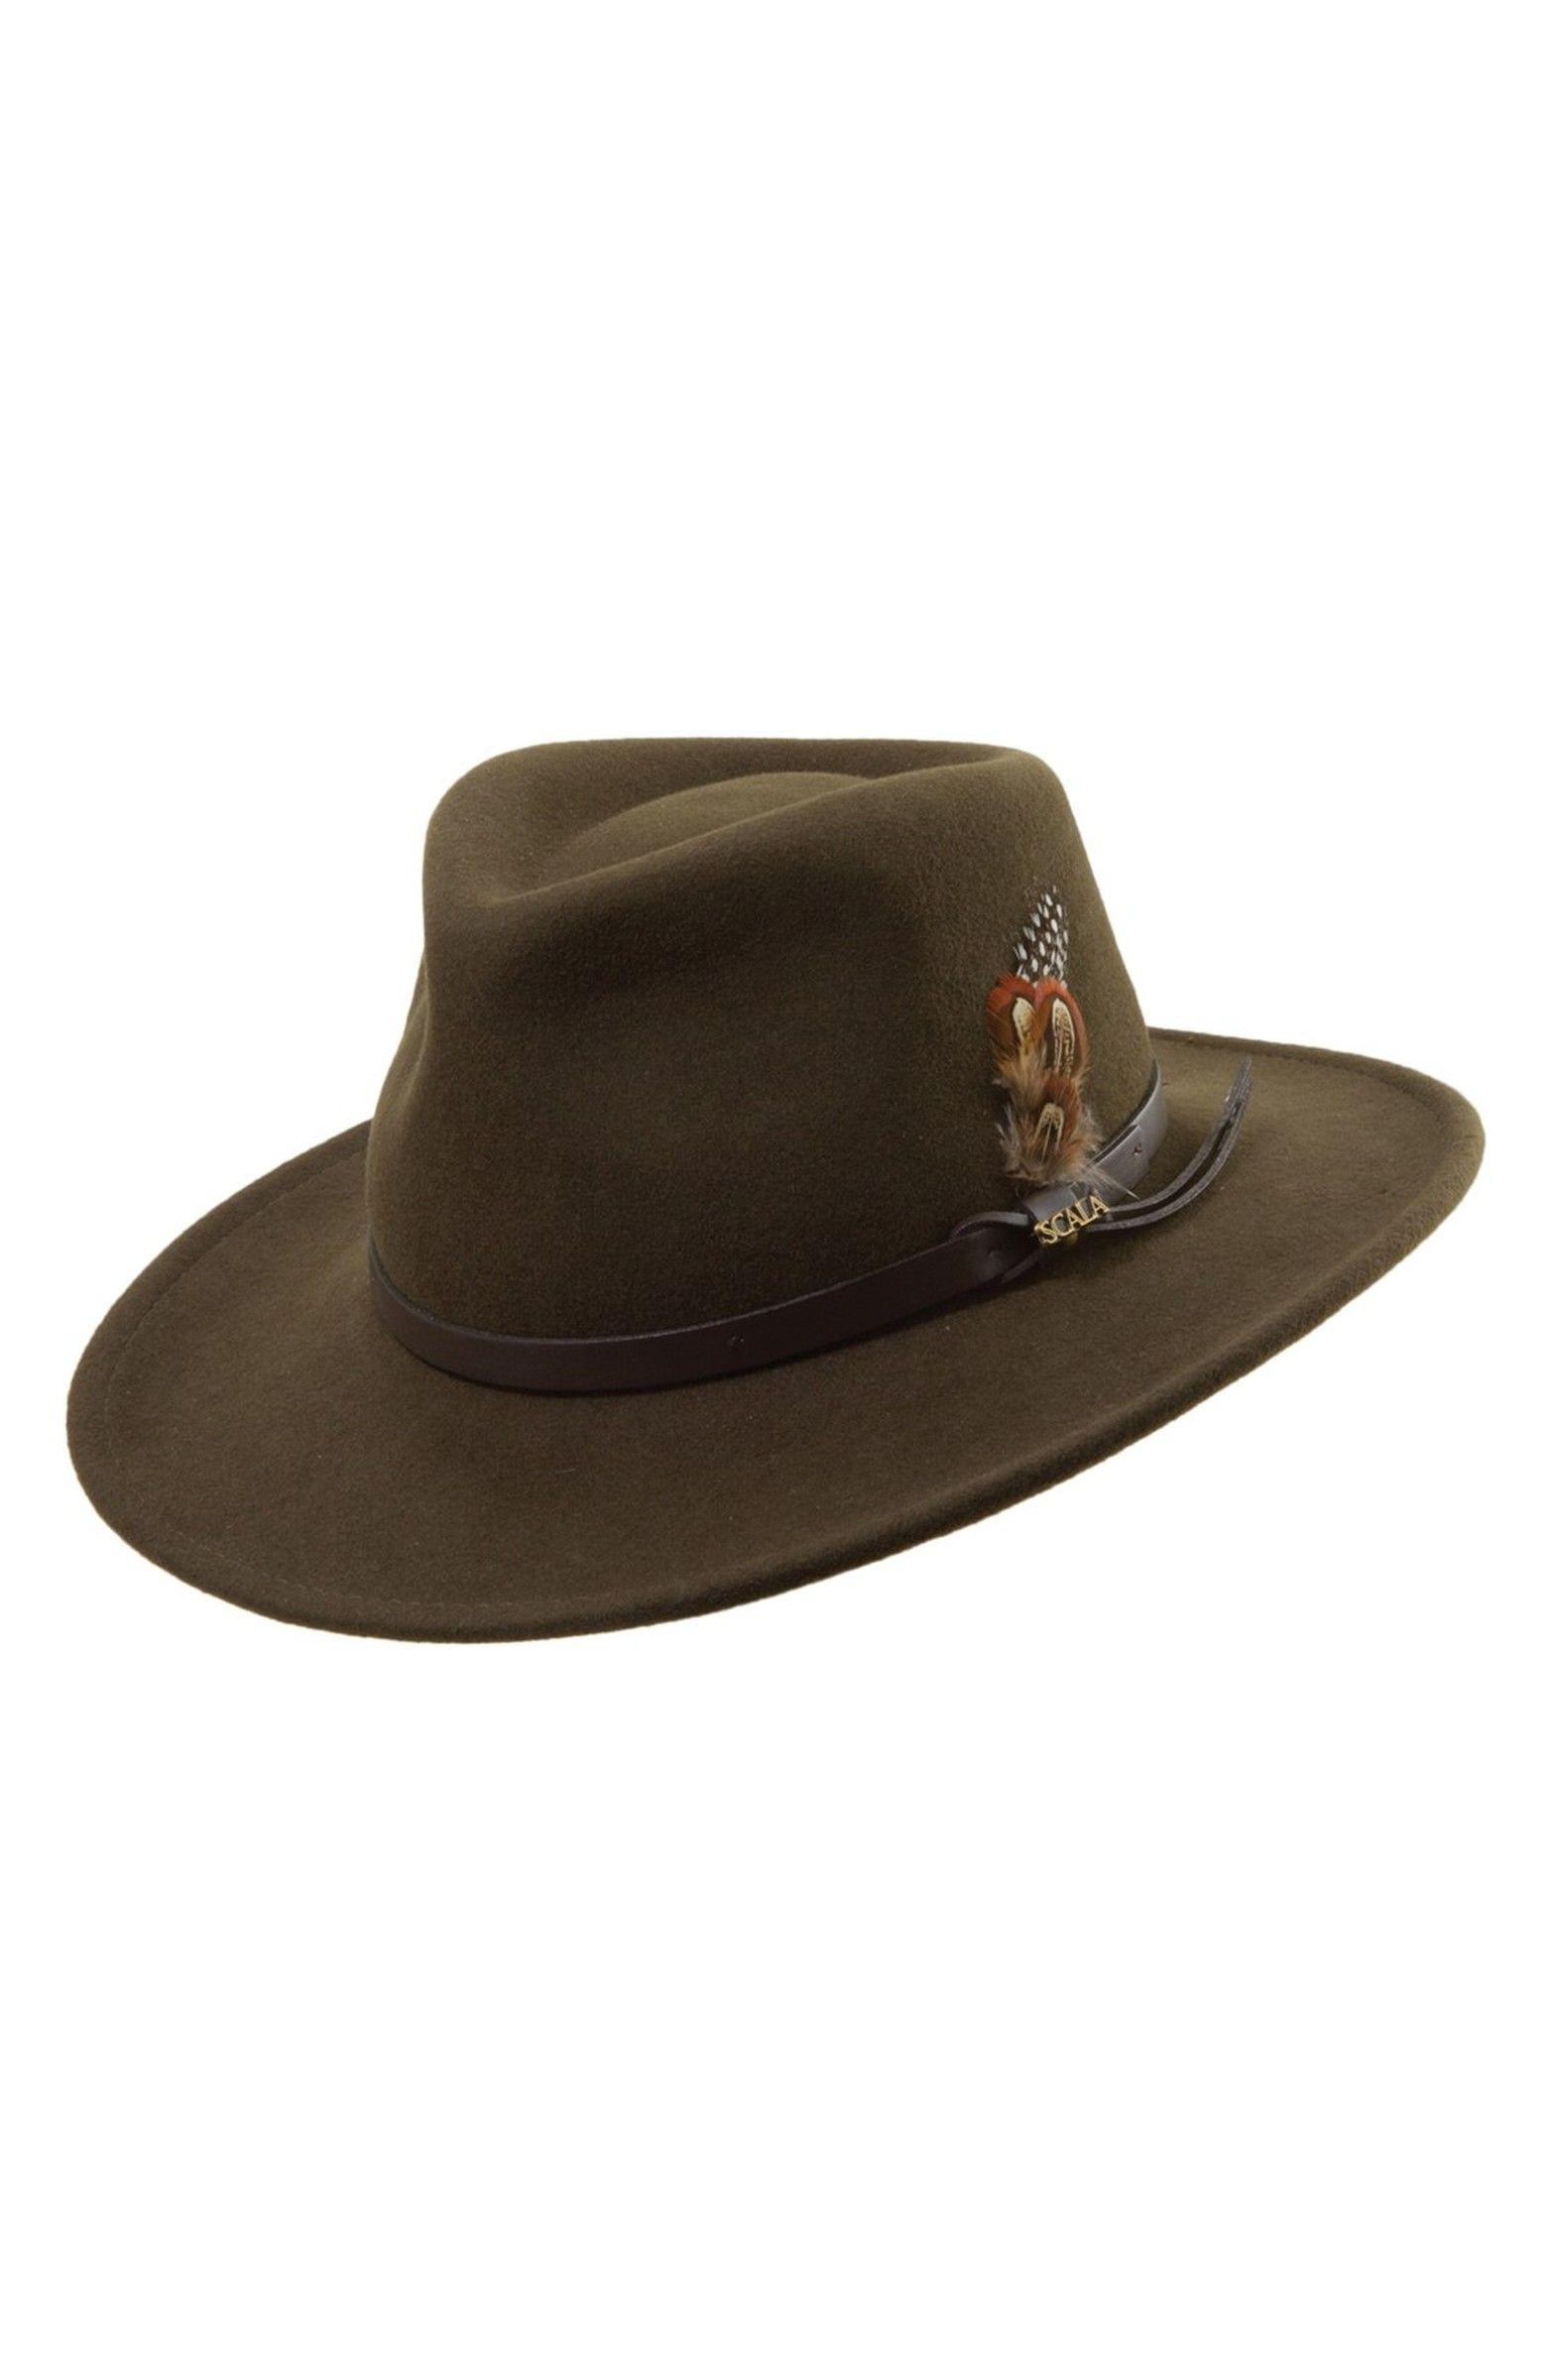 030503ca4b200 Main Image - Scala  Classico  Crushable Felt Outback Hat